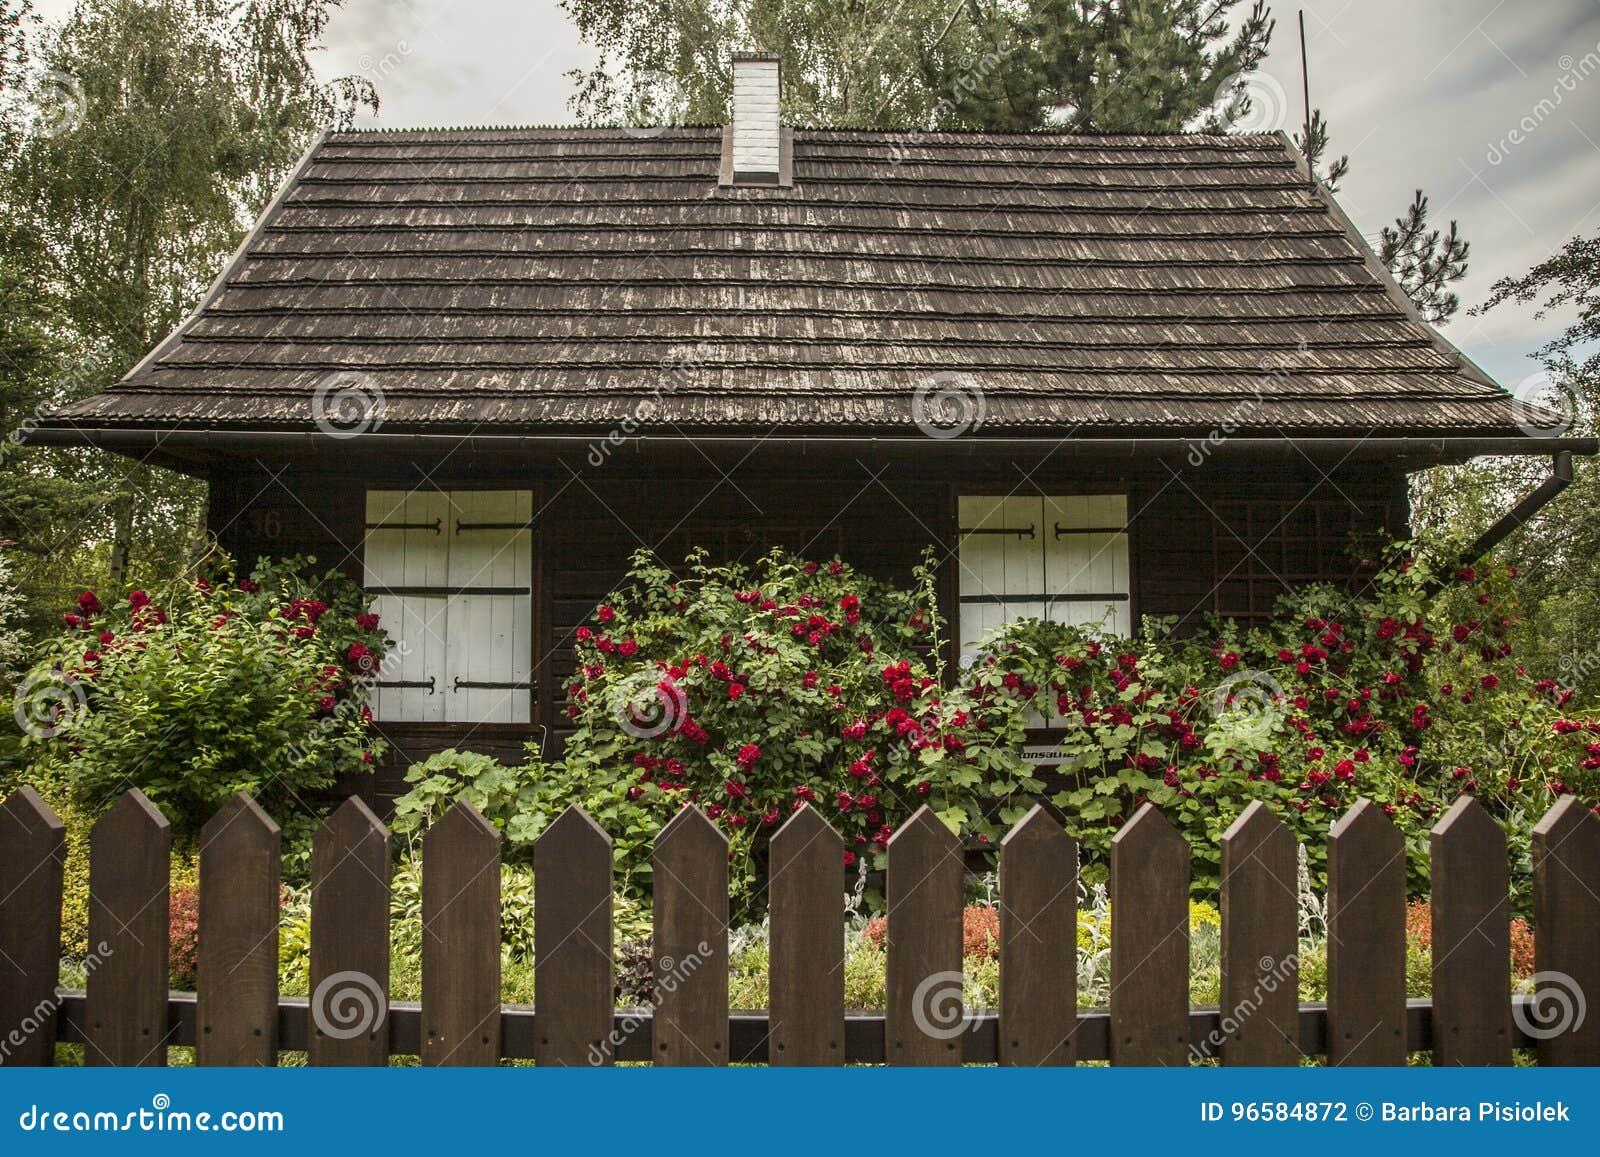 Kazimierz Dolny, Poland - an old house in a garden/fence.